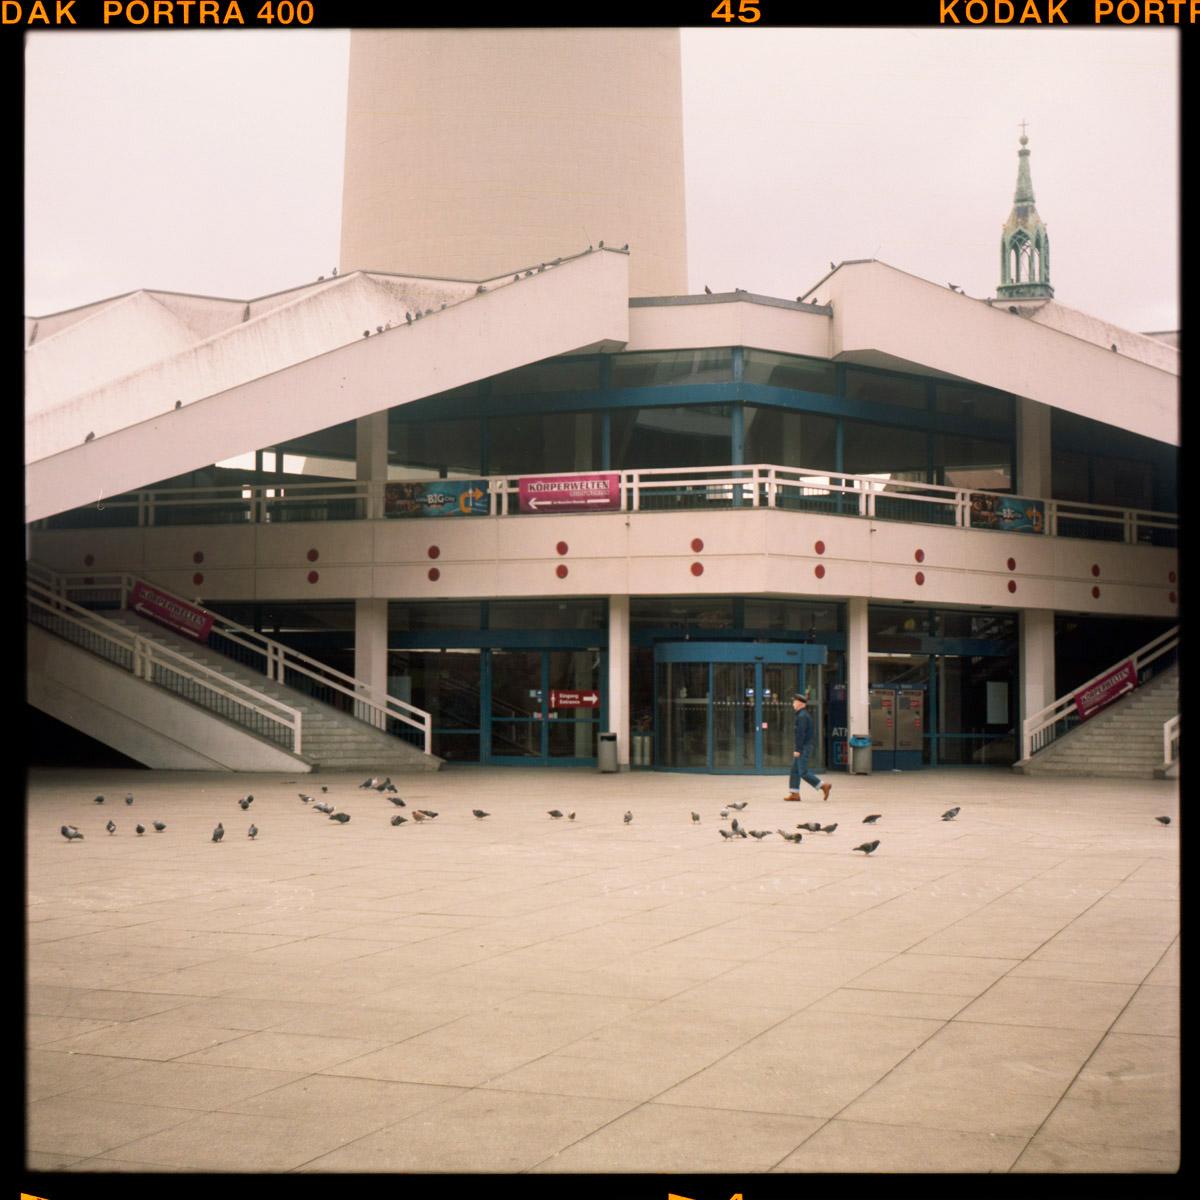 Berlin, Alexanderplatz, Fernsehturm, Corona, Lockdown, Abandoned, 2021